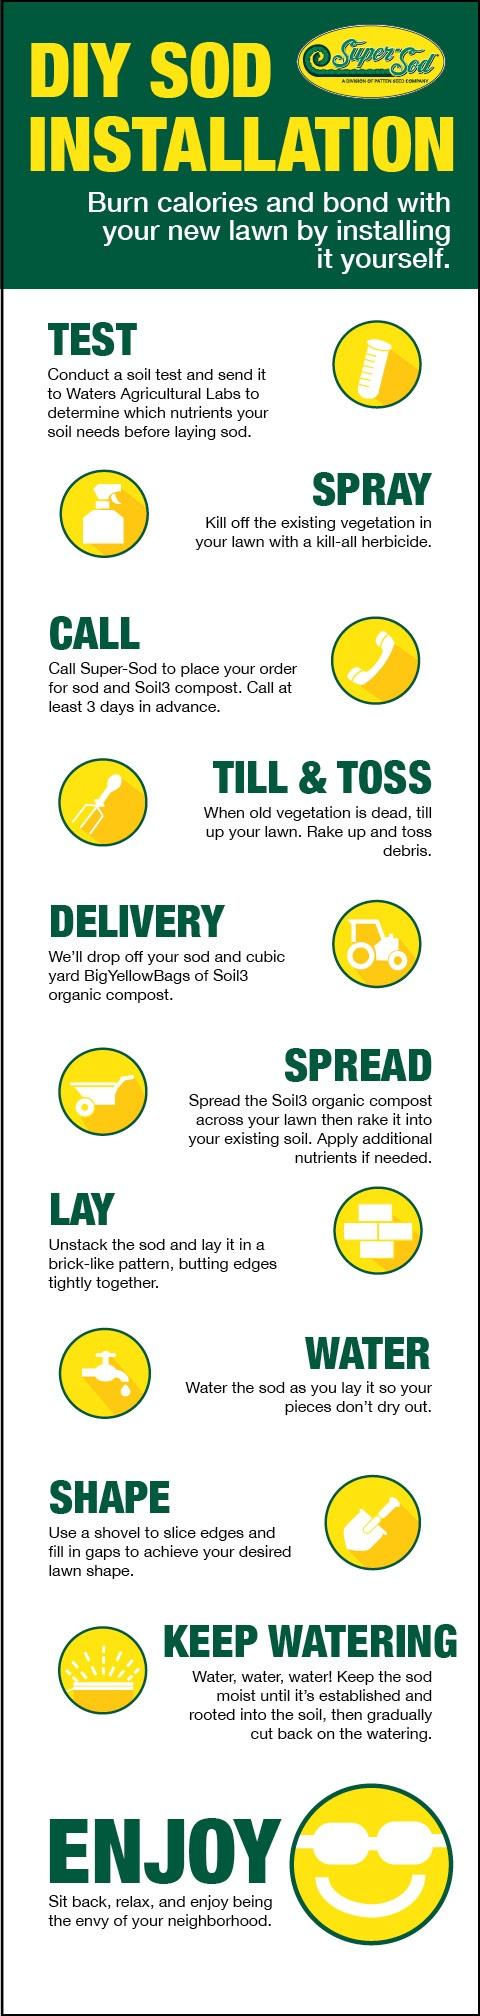 DIY Sod Installation Steps Infographic.jpg